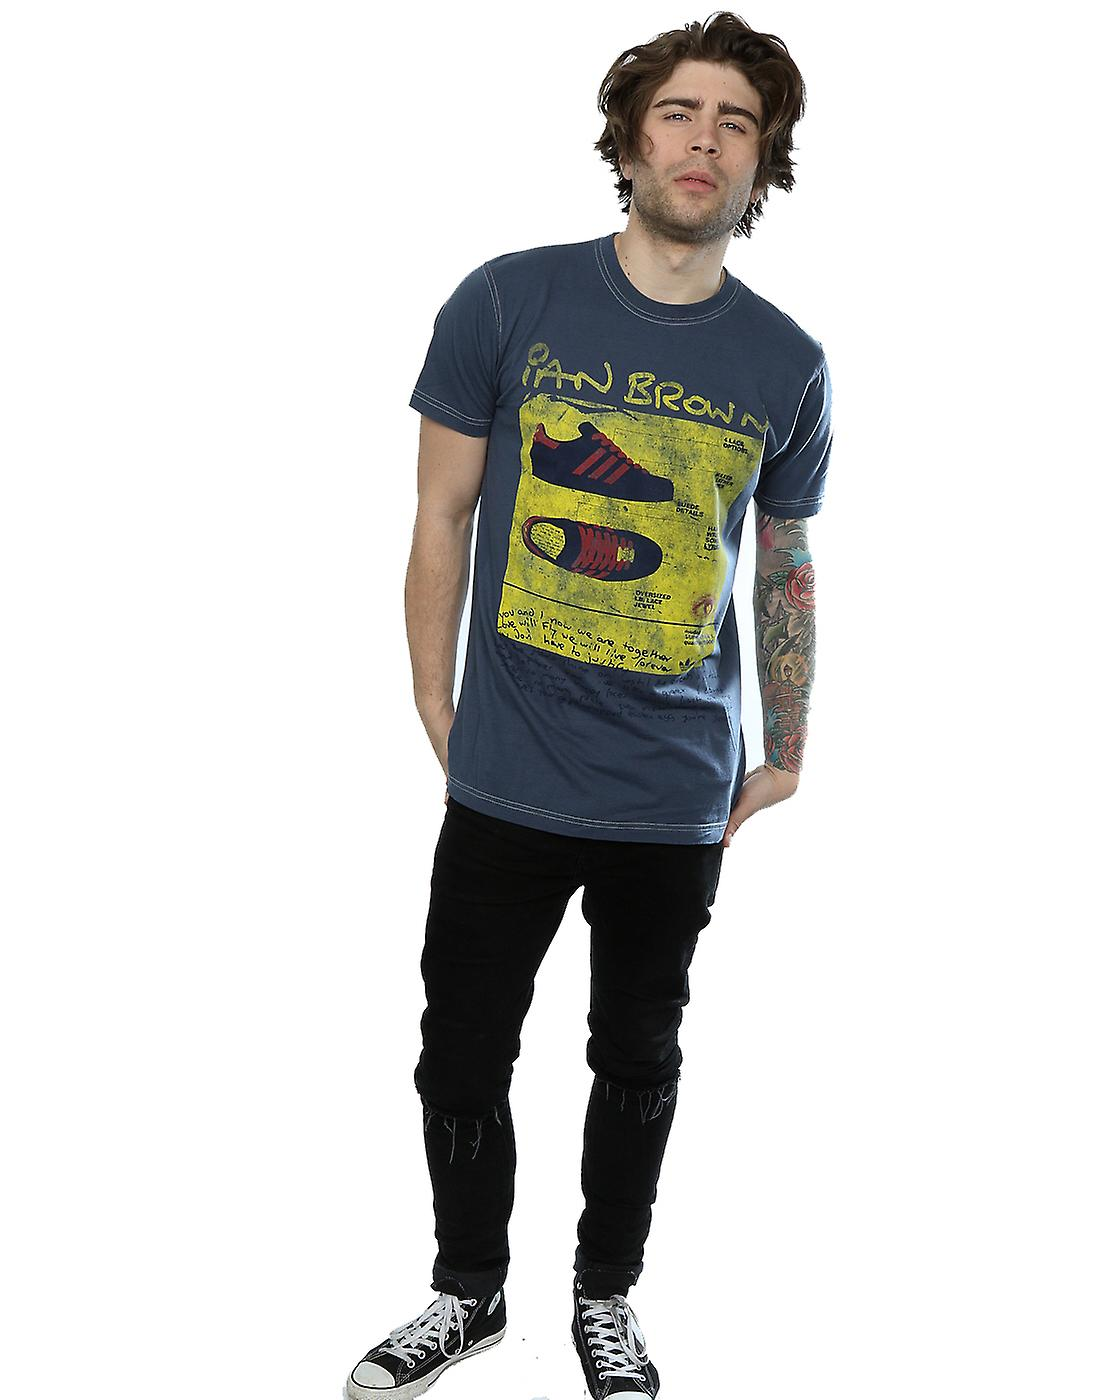 Aftershow Men's Ian Brown Adidas Shoes T-Shirt